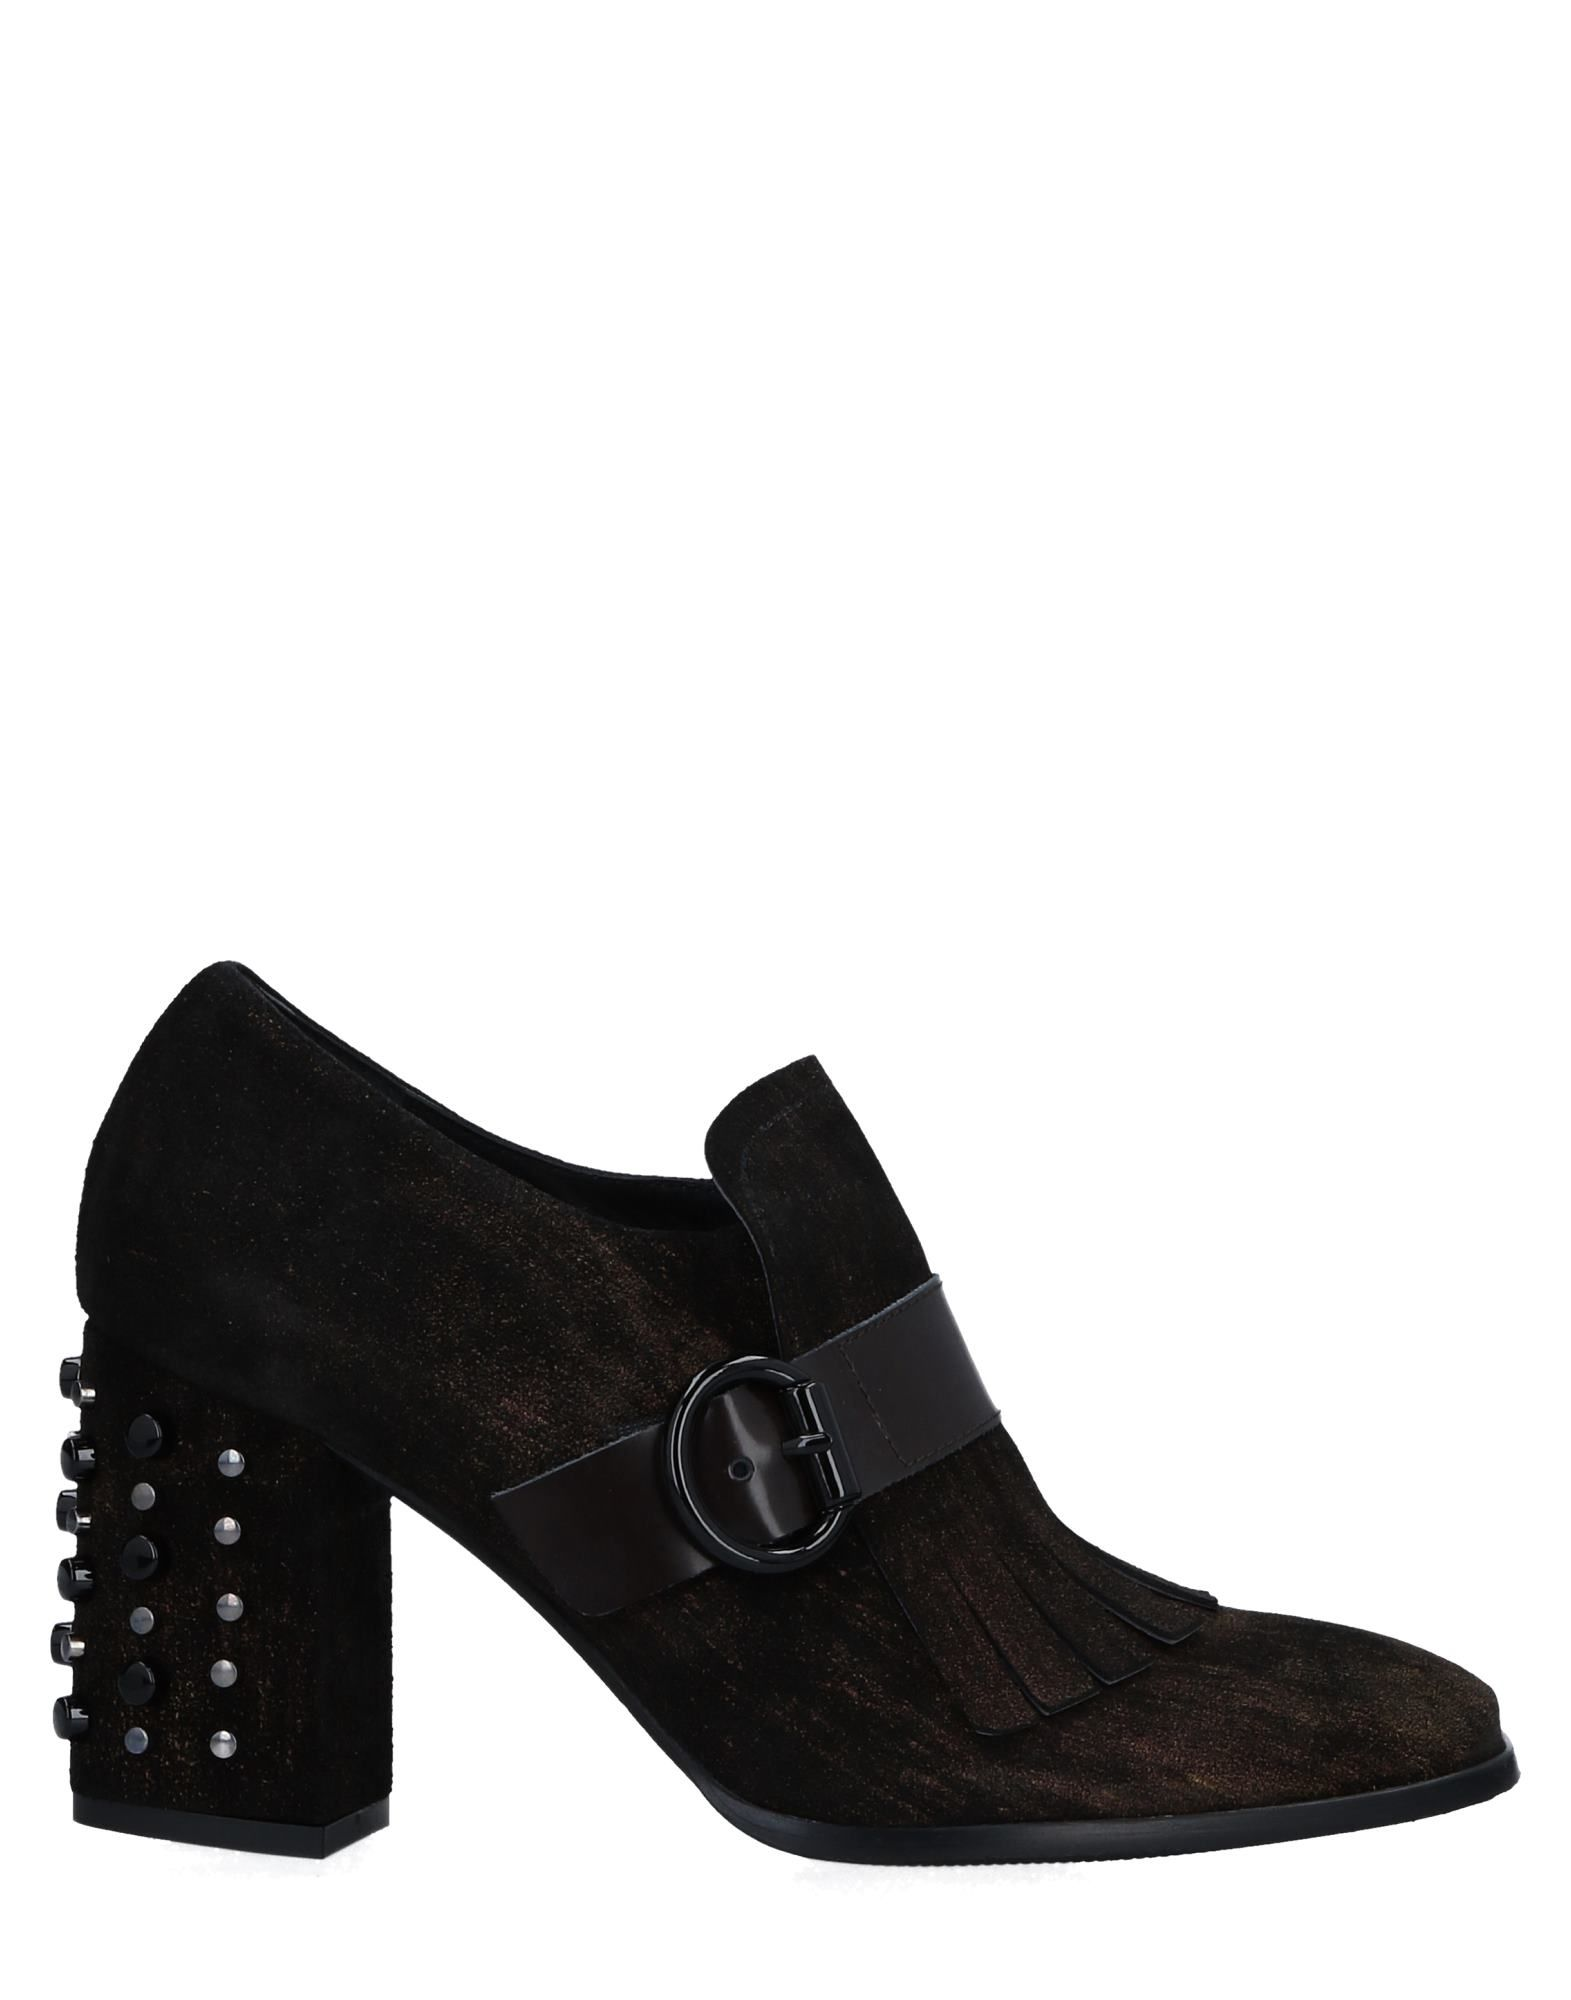 Zinda Loafers Loafers - Women Zinda Loafers Zinda online on  Australia - 11518003XF 46491e